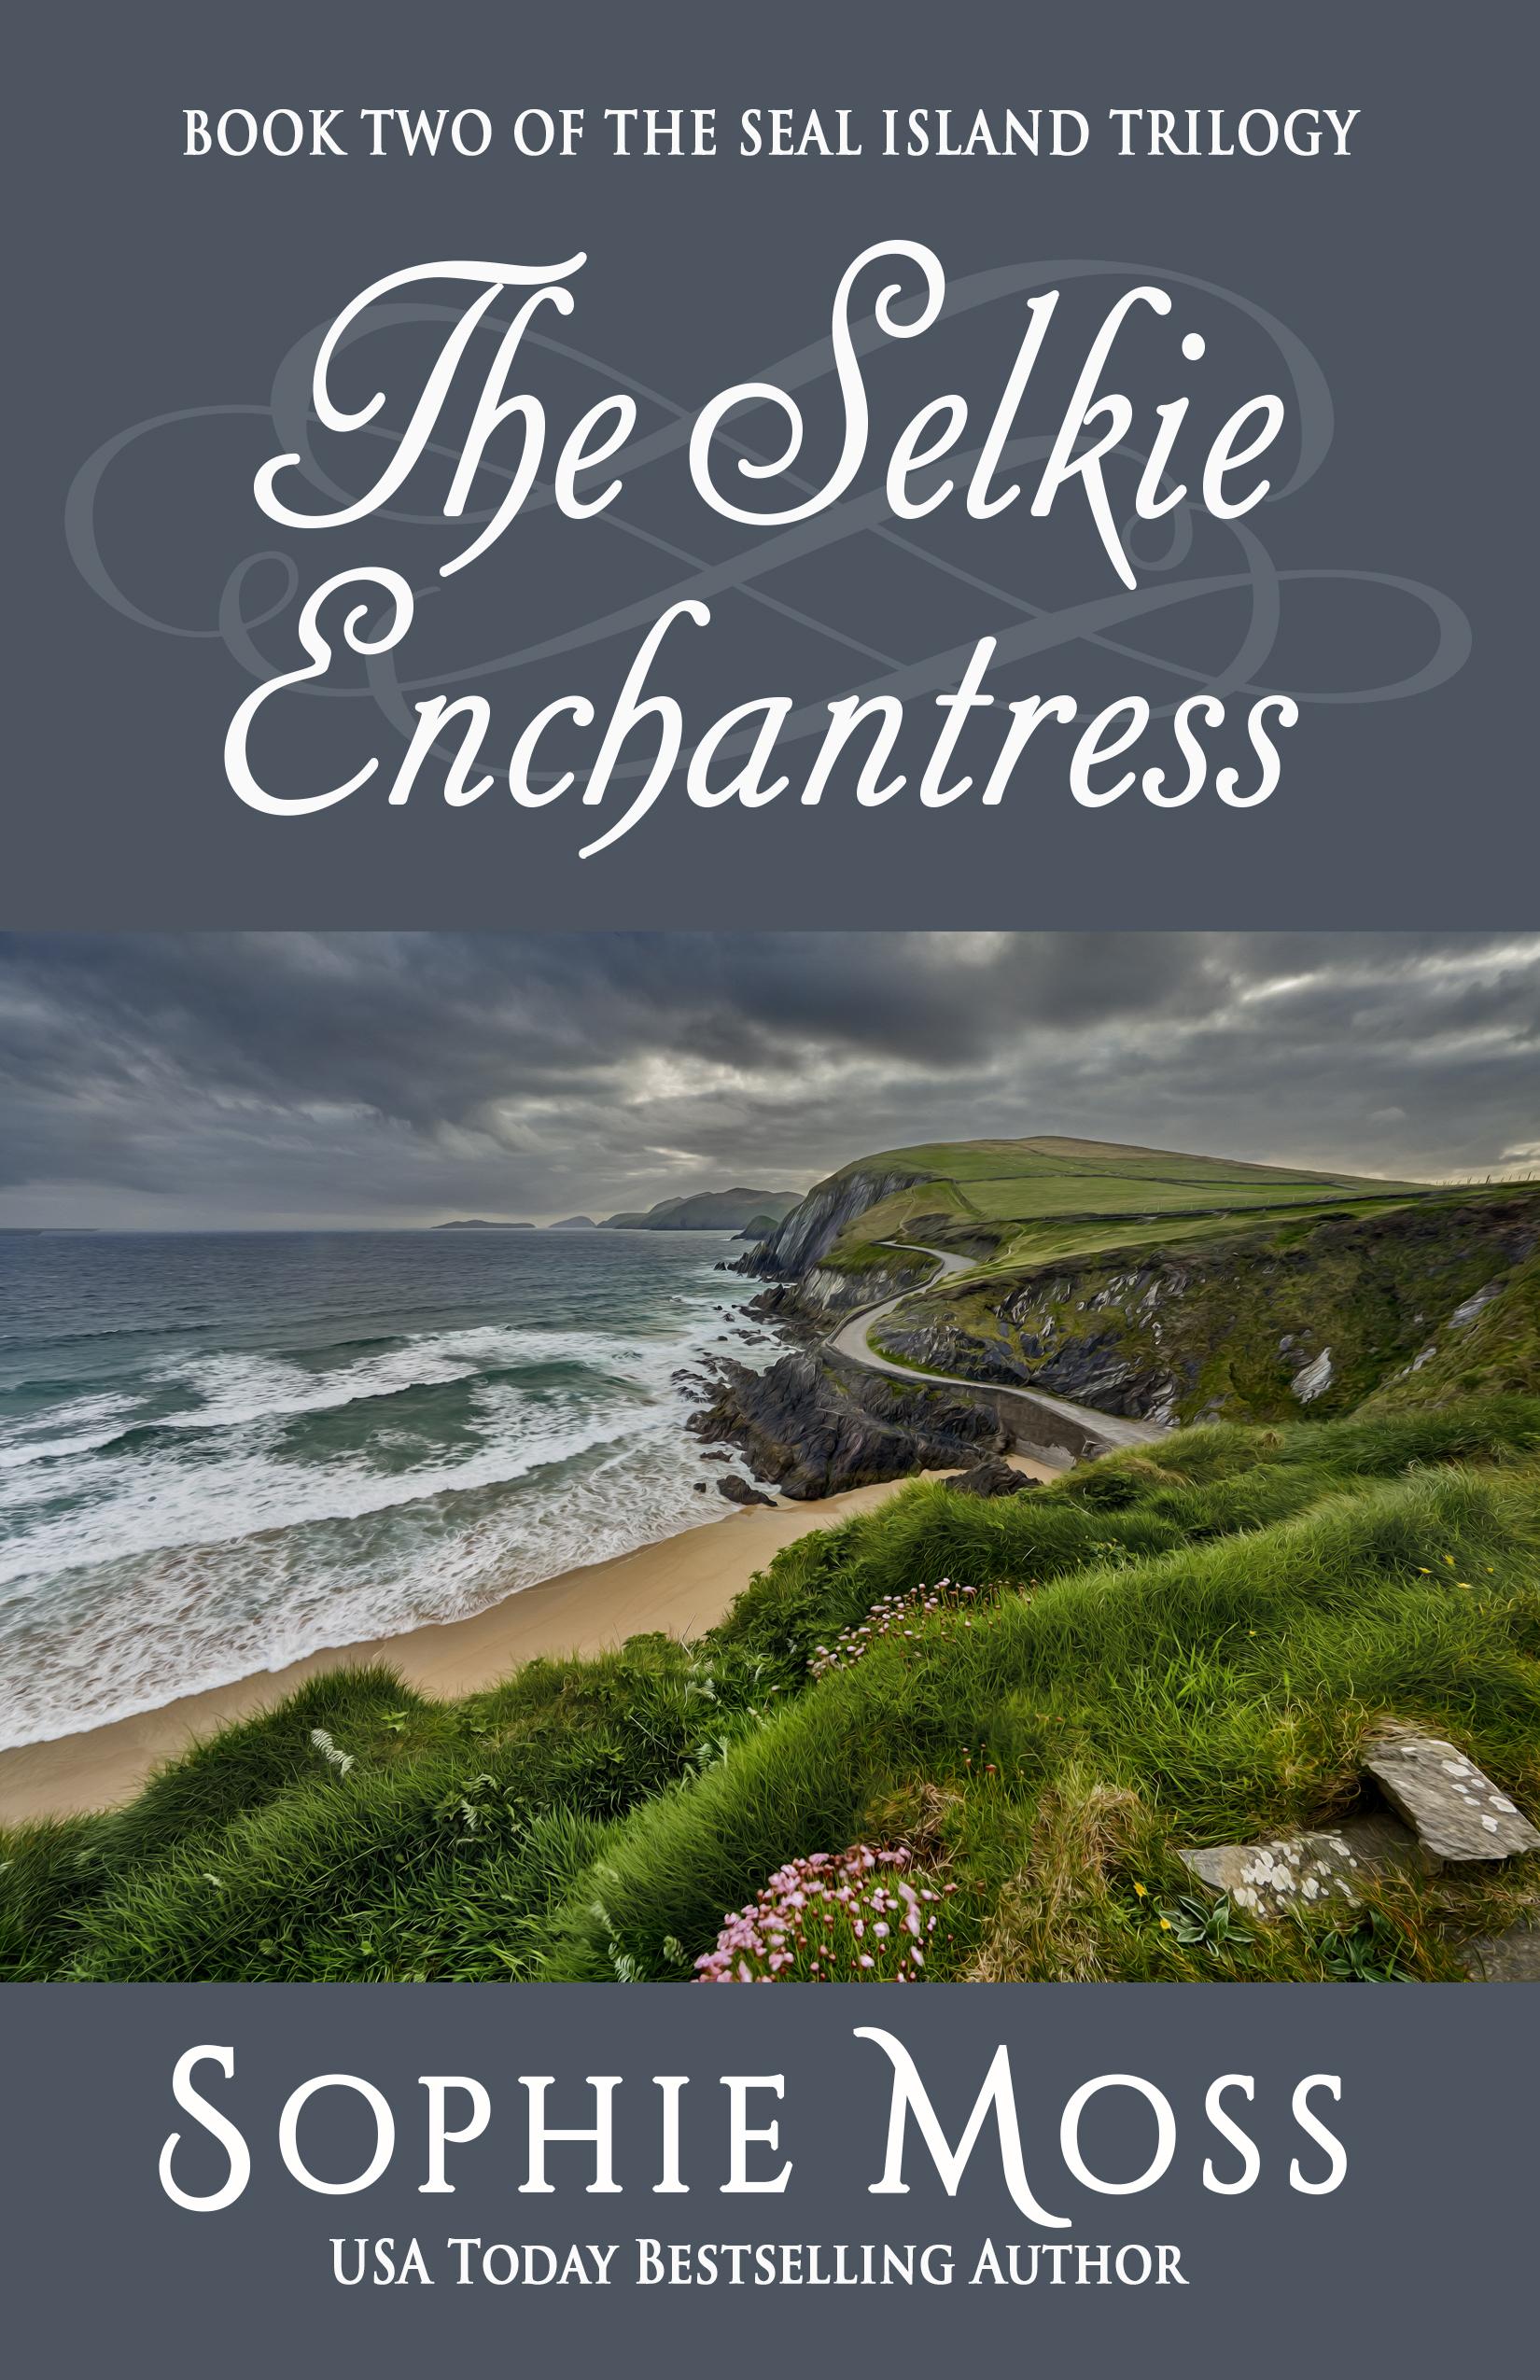 The Selkie Enchantress ebook cover Aug 14 2017 VELLUM.jpg